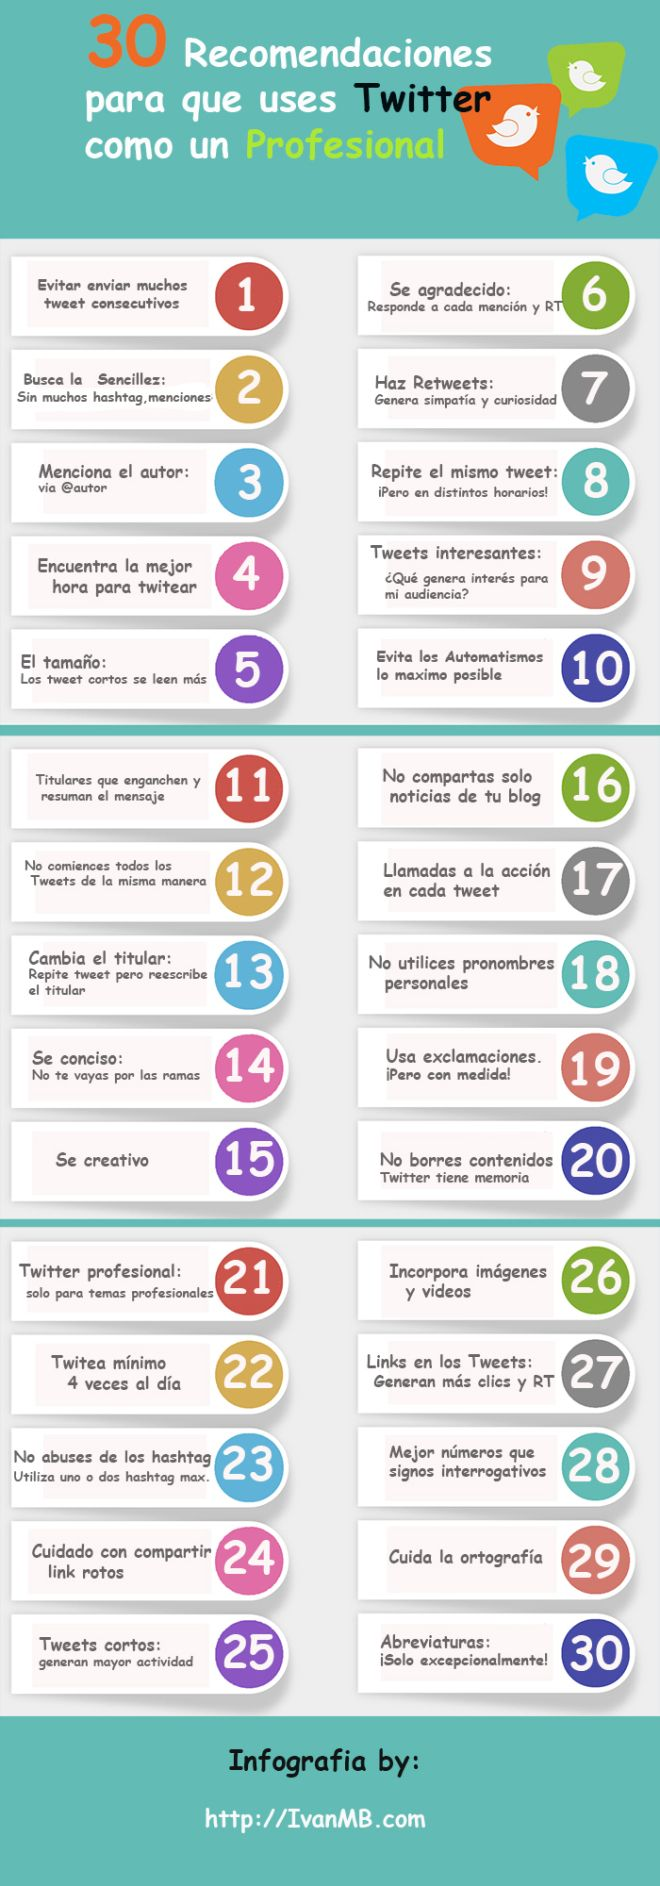 30 recomendaciones para que uses Twitter como un profesional #infografia